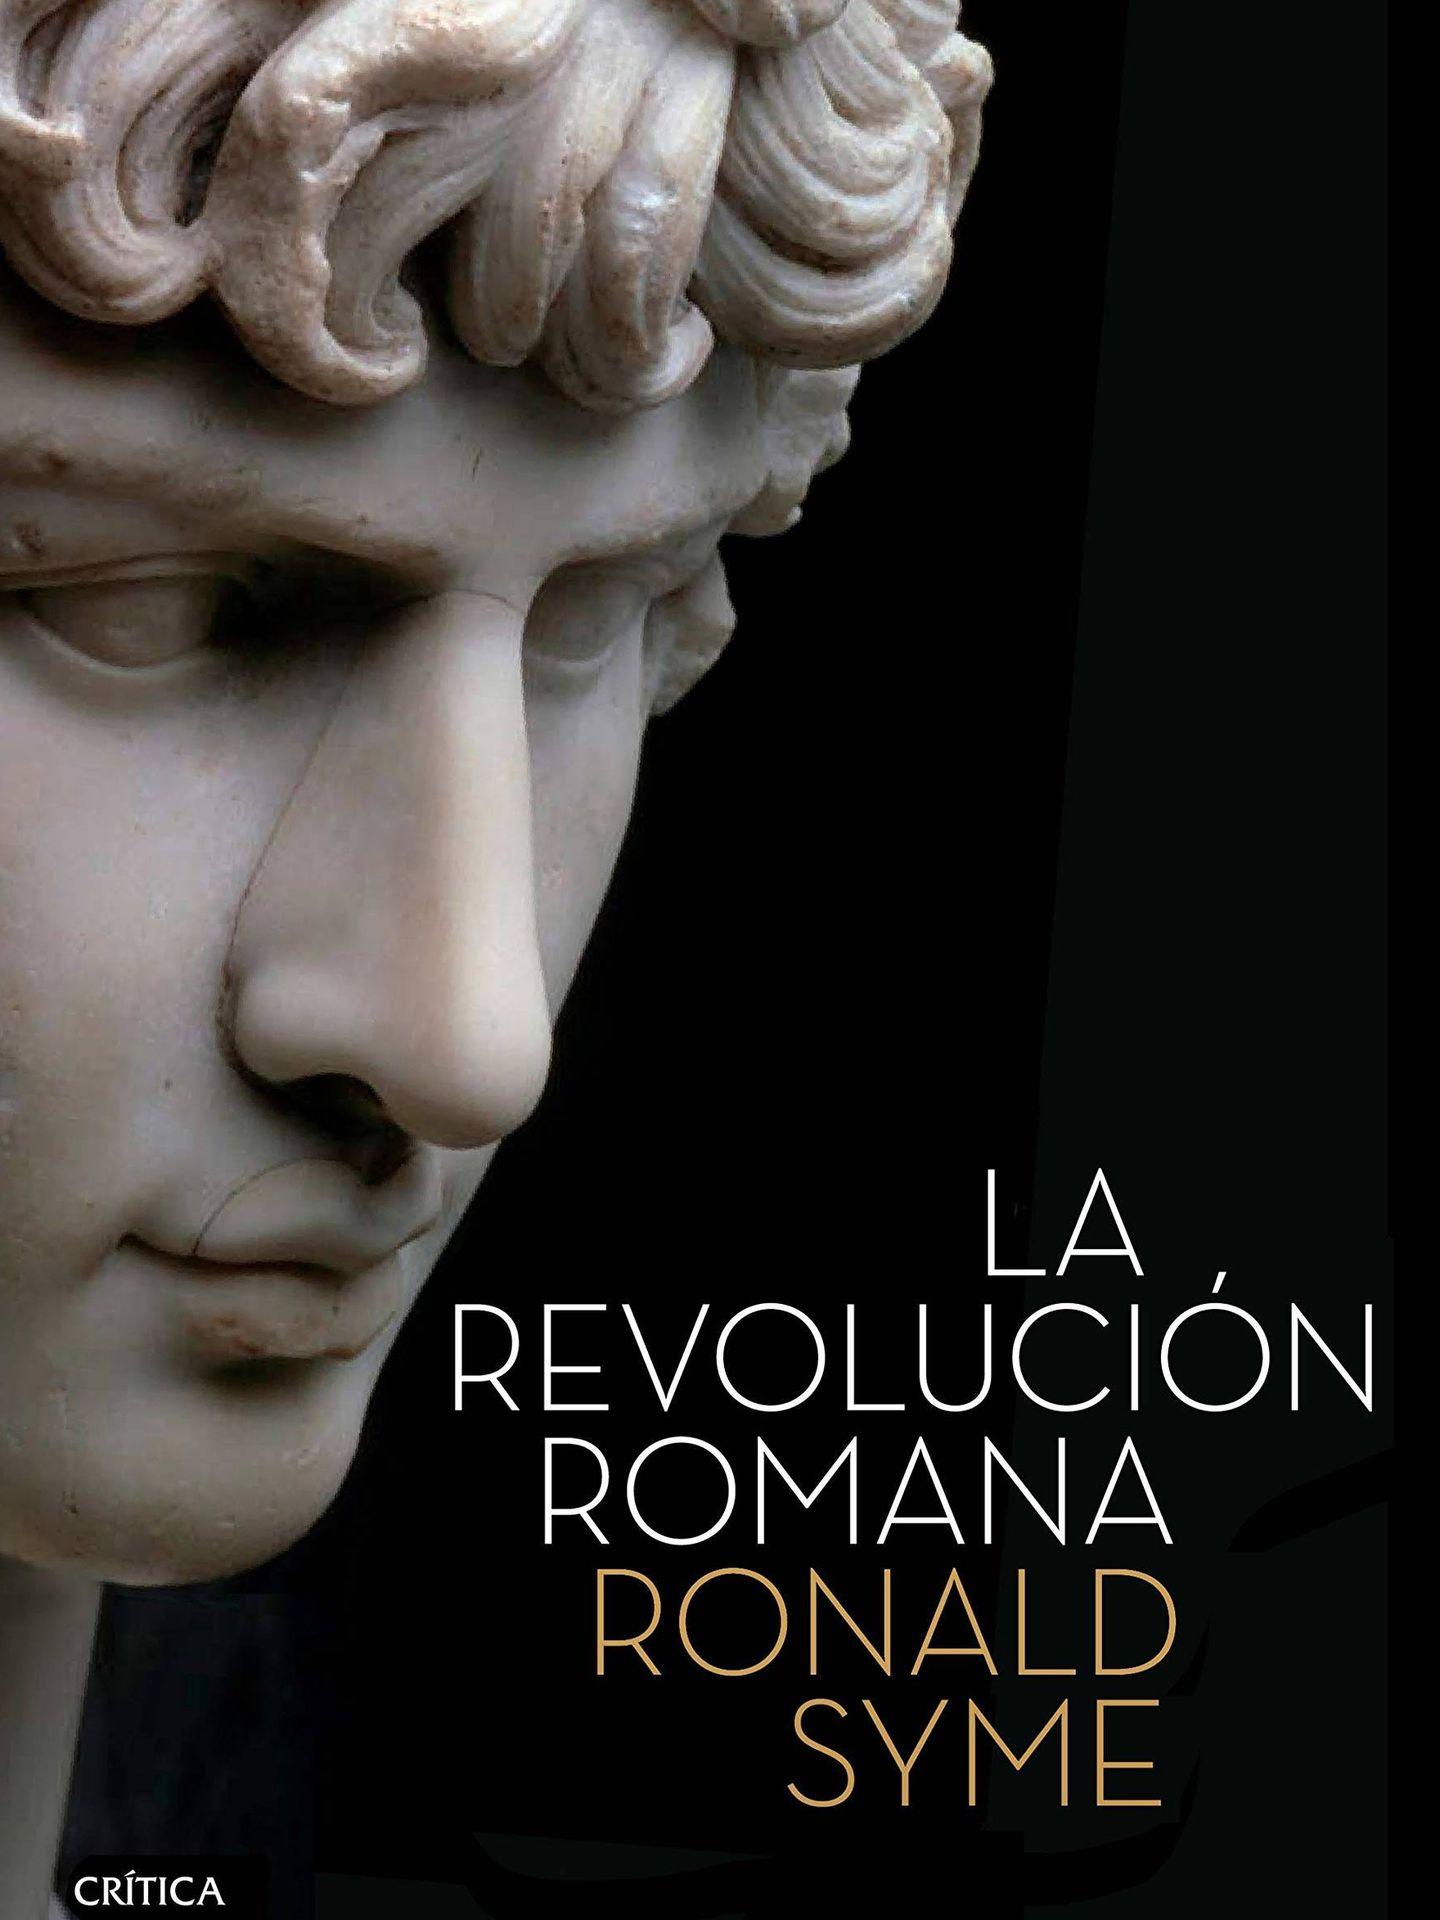 'La revolución romana'